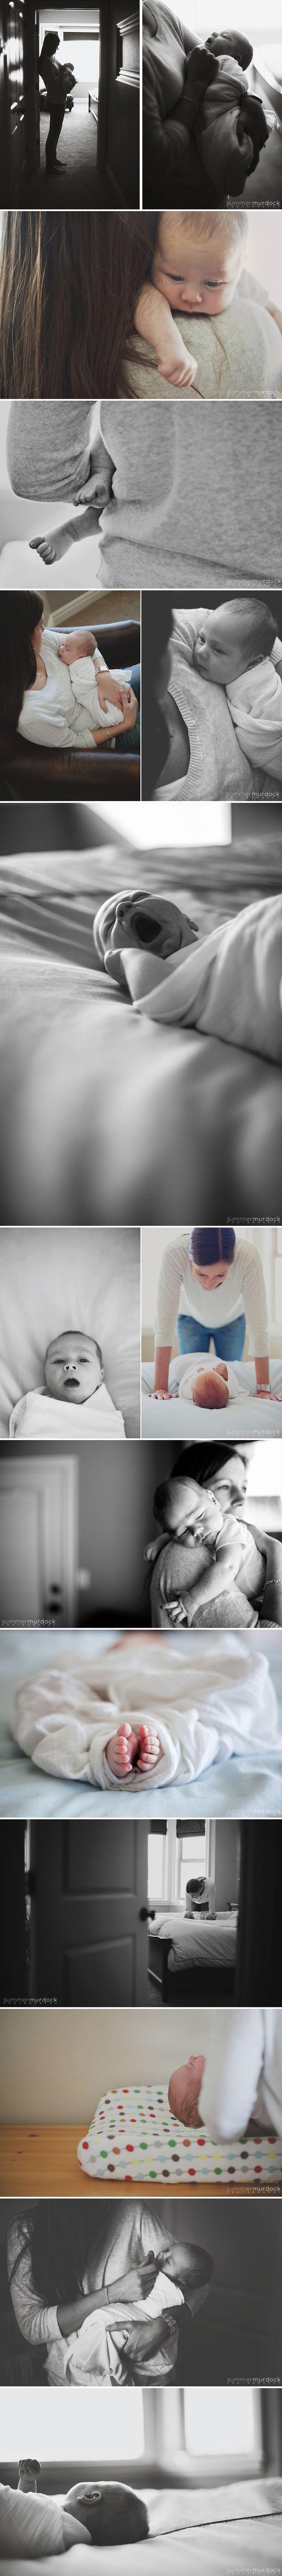 Newborn Lifestyle Photography | Summer Murdock Photography SLC Area Family Photographer